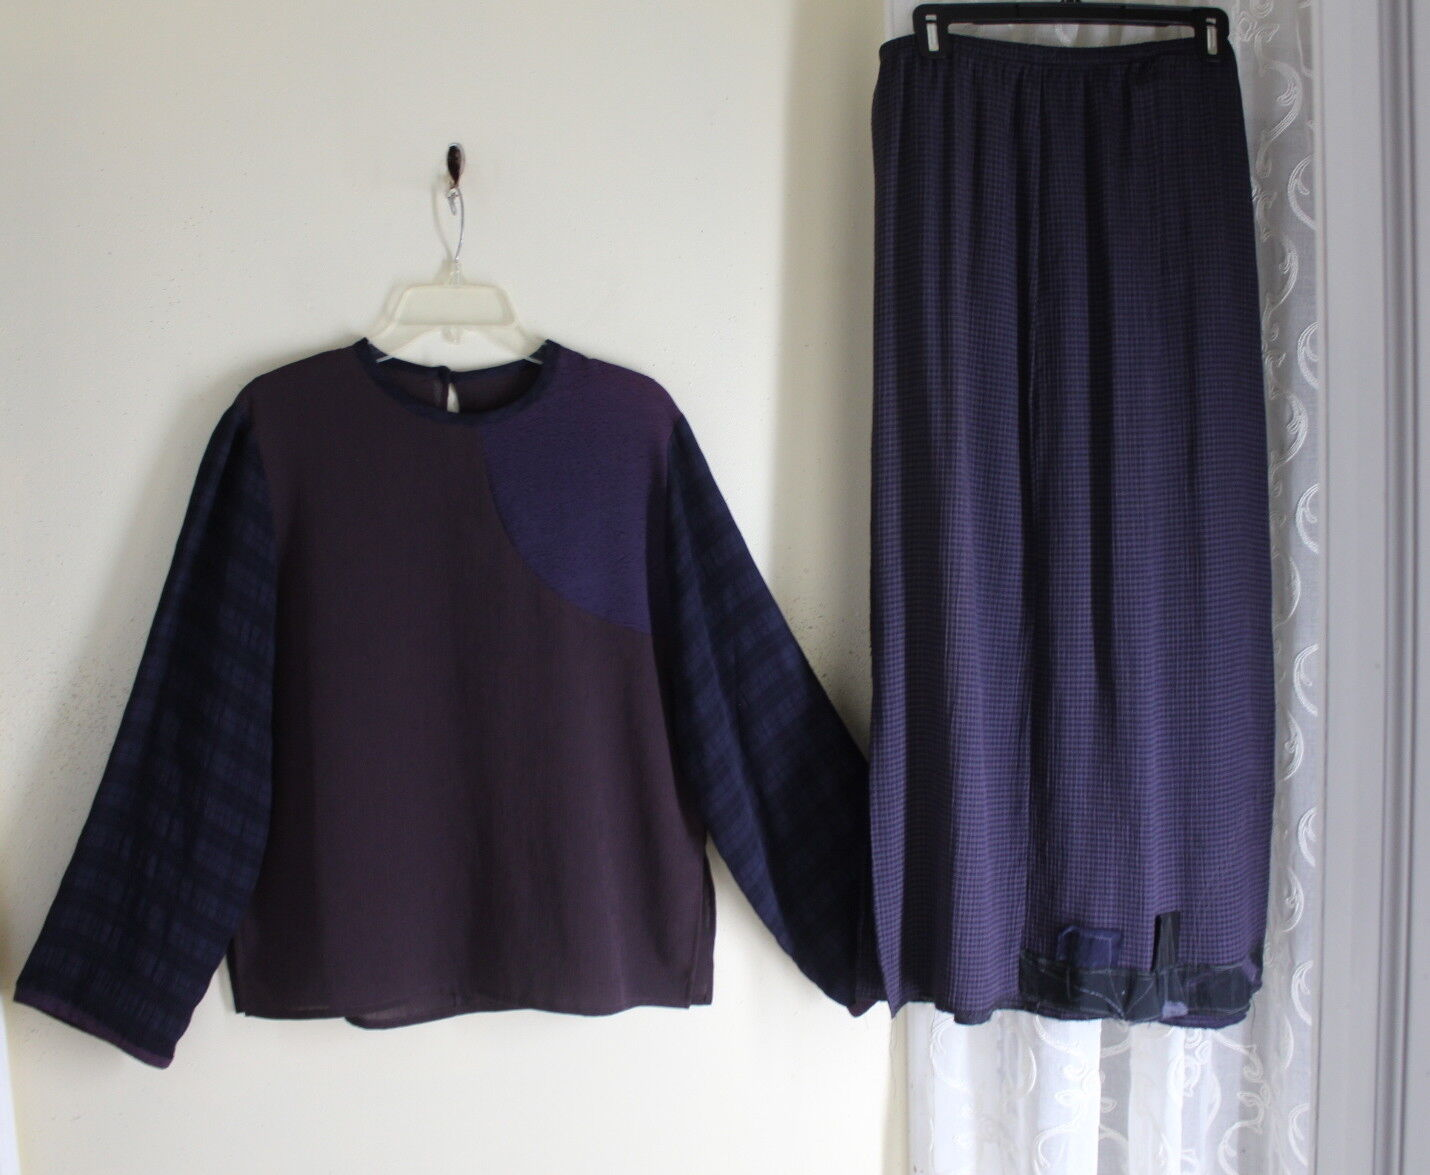 damen JESSICA 2 S M L XL FUNKY Boxy Lagenlook Skirt + Patchwork Top lilas